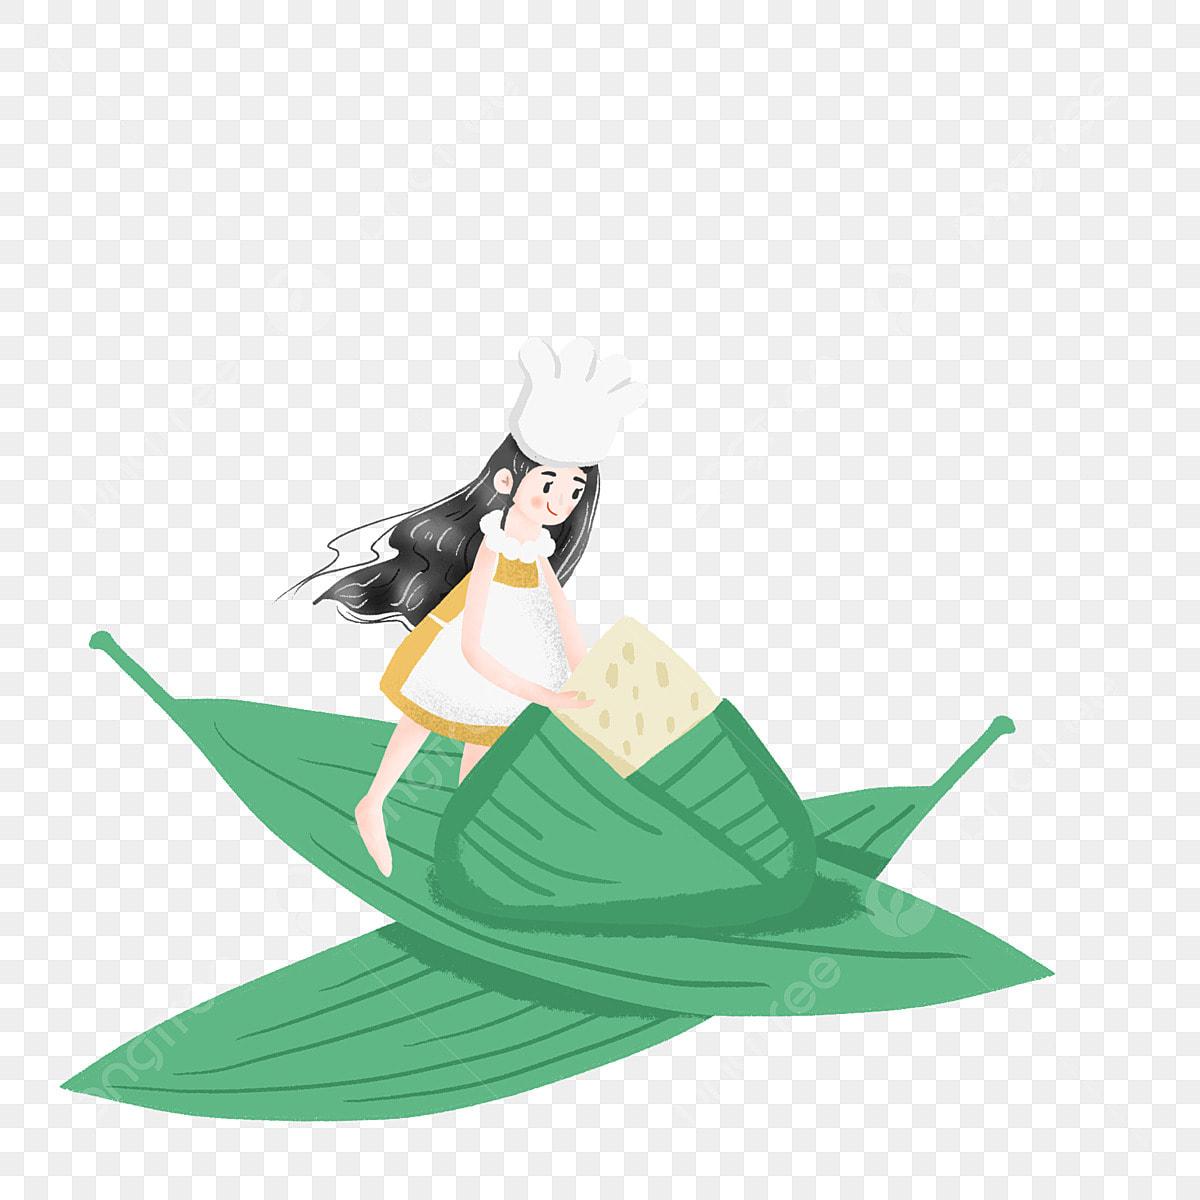 Mudah Digambar Tangan Ilustrator Poster Ilustrator